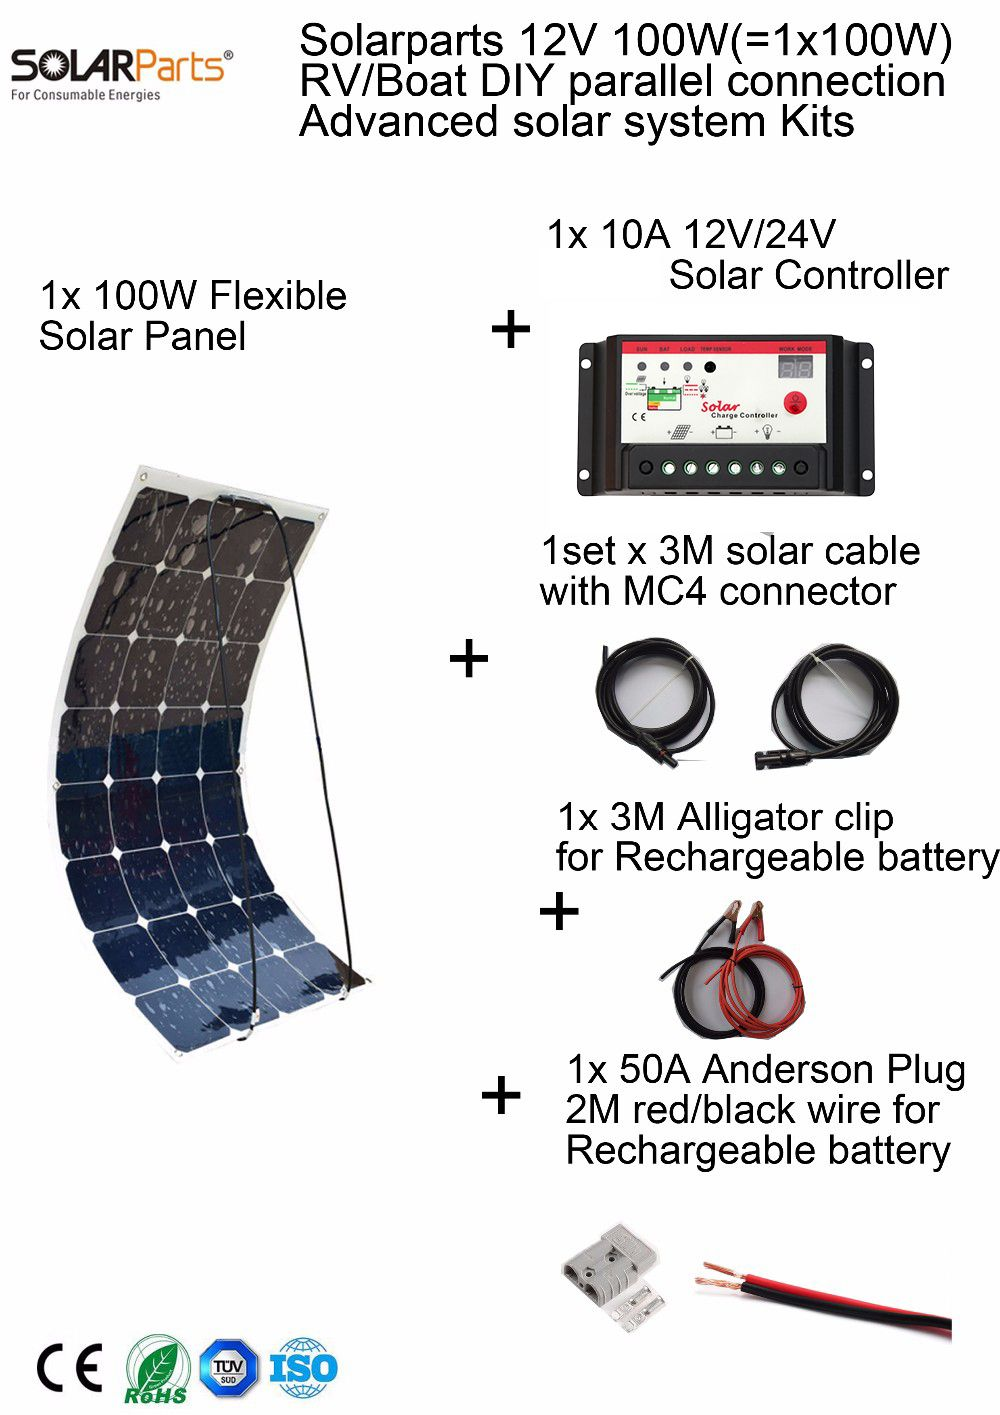 Solarparts 100W DIY RV/Marine Kits Solar System 1x100W flexible solar panel 12V,1x 10A 12V solar controller set cables cheap .